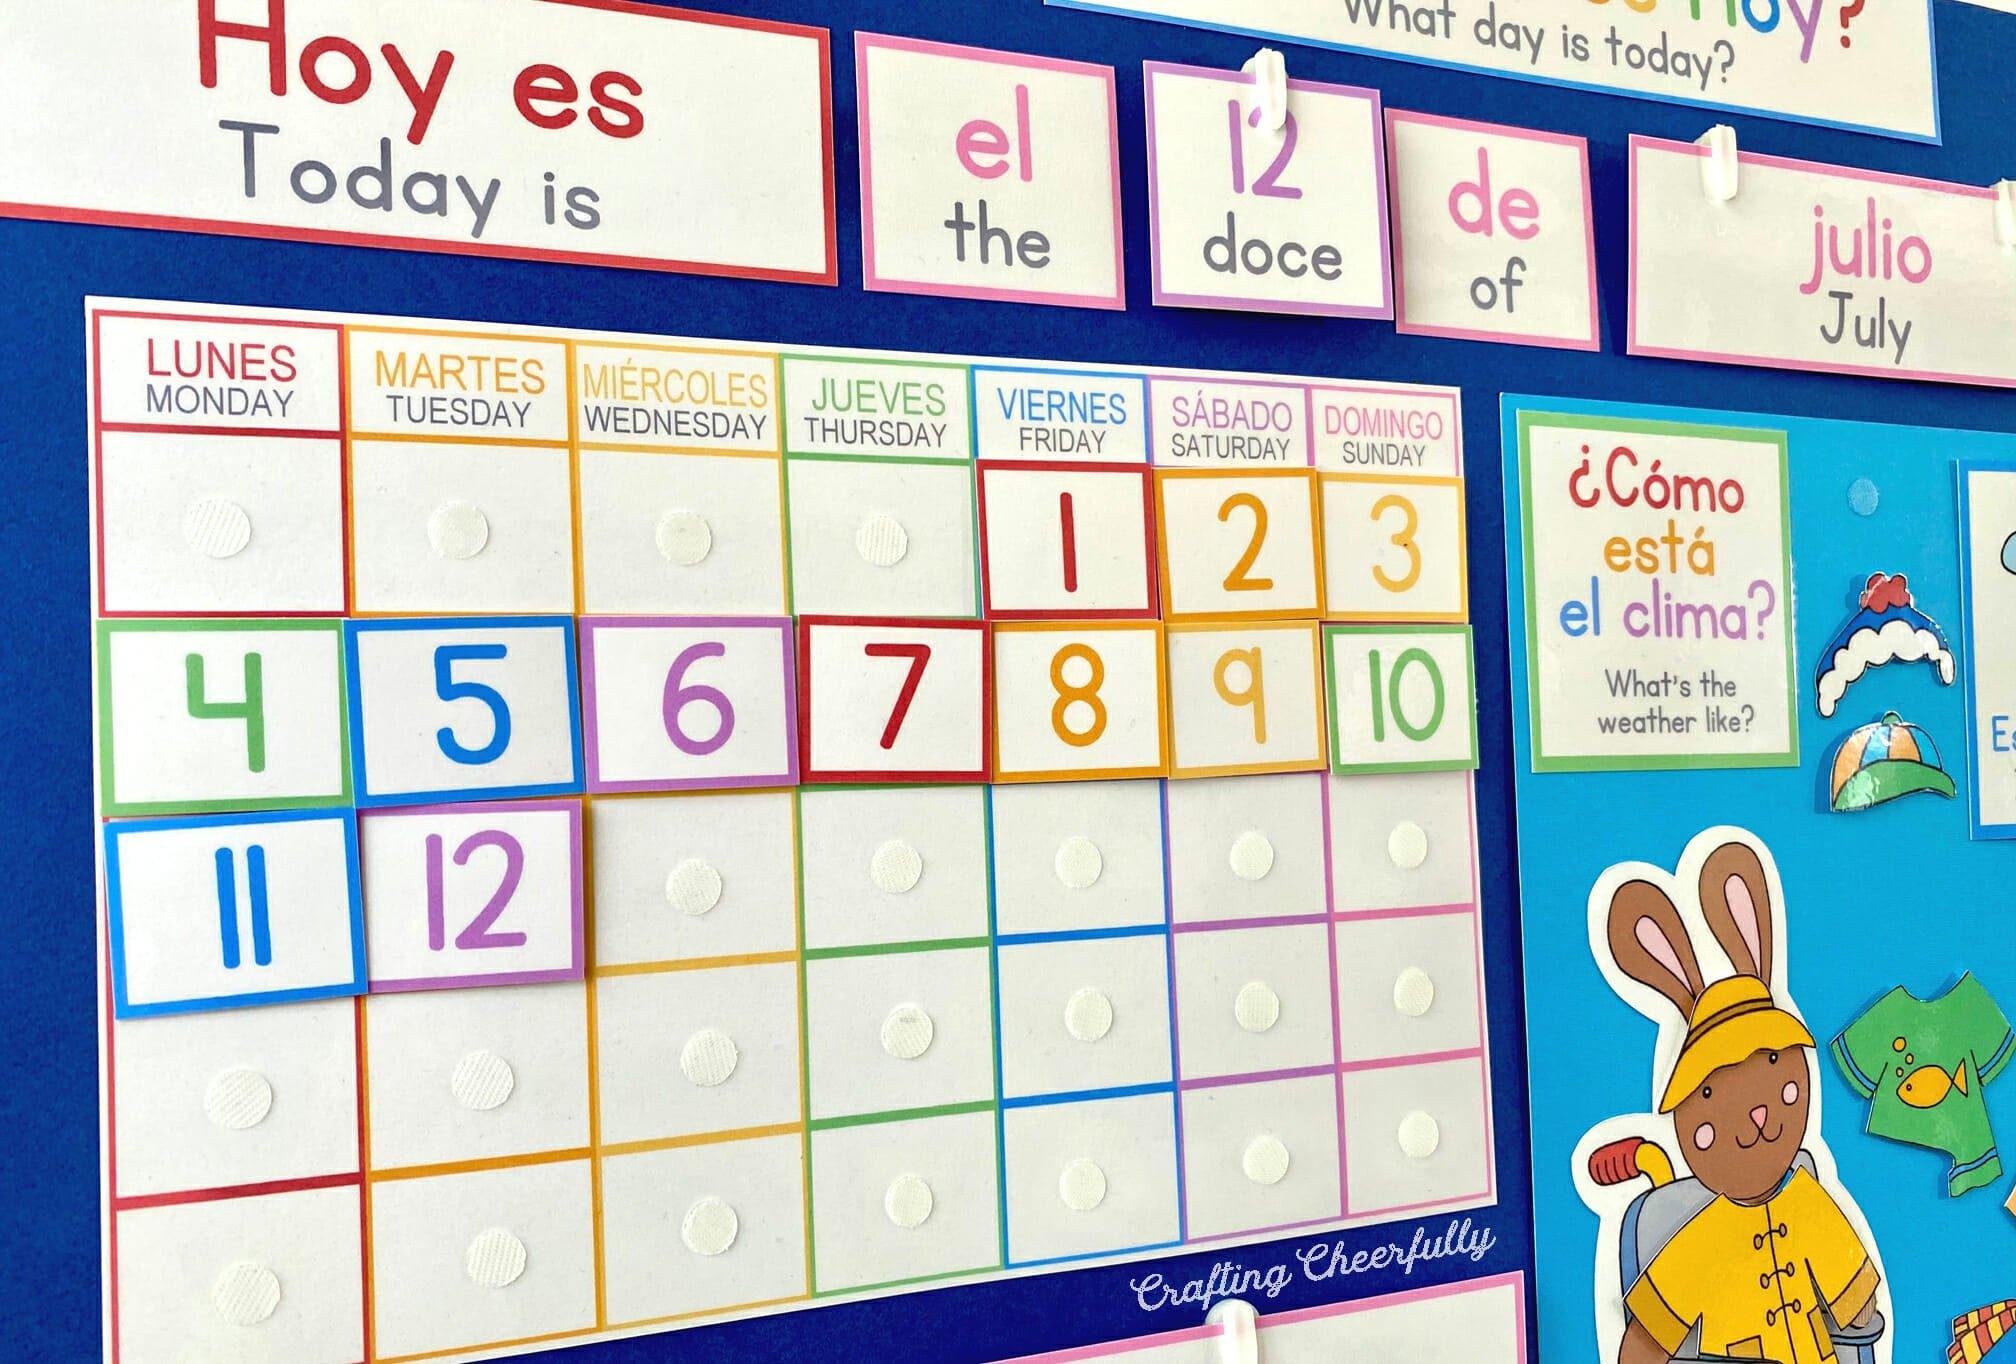 DIY Morning Board in Spanish and English